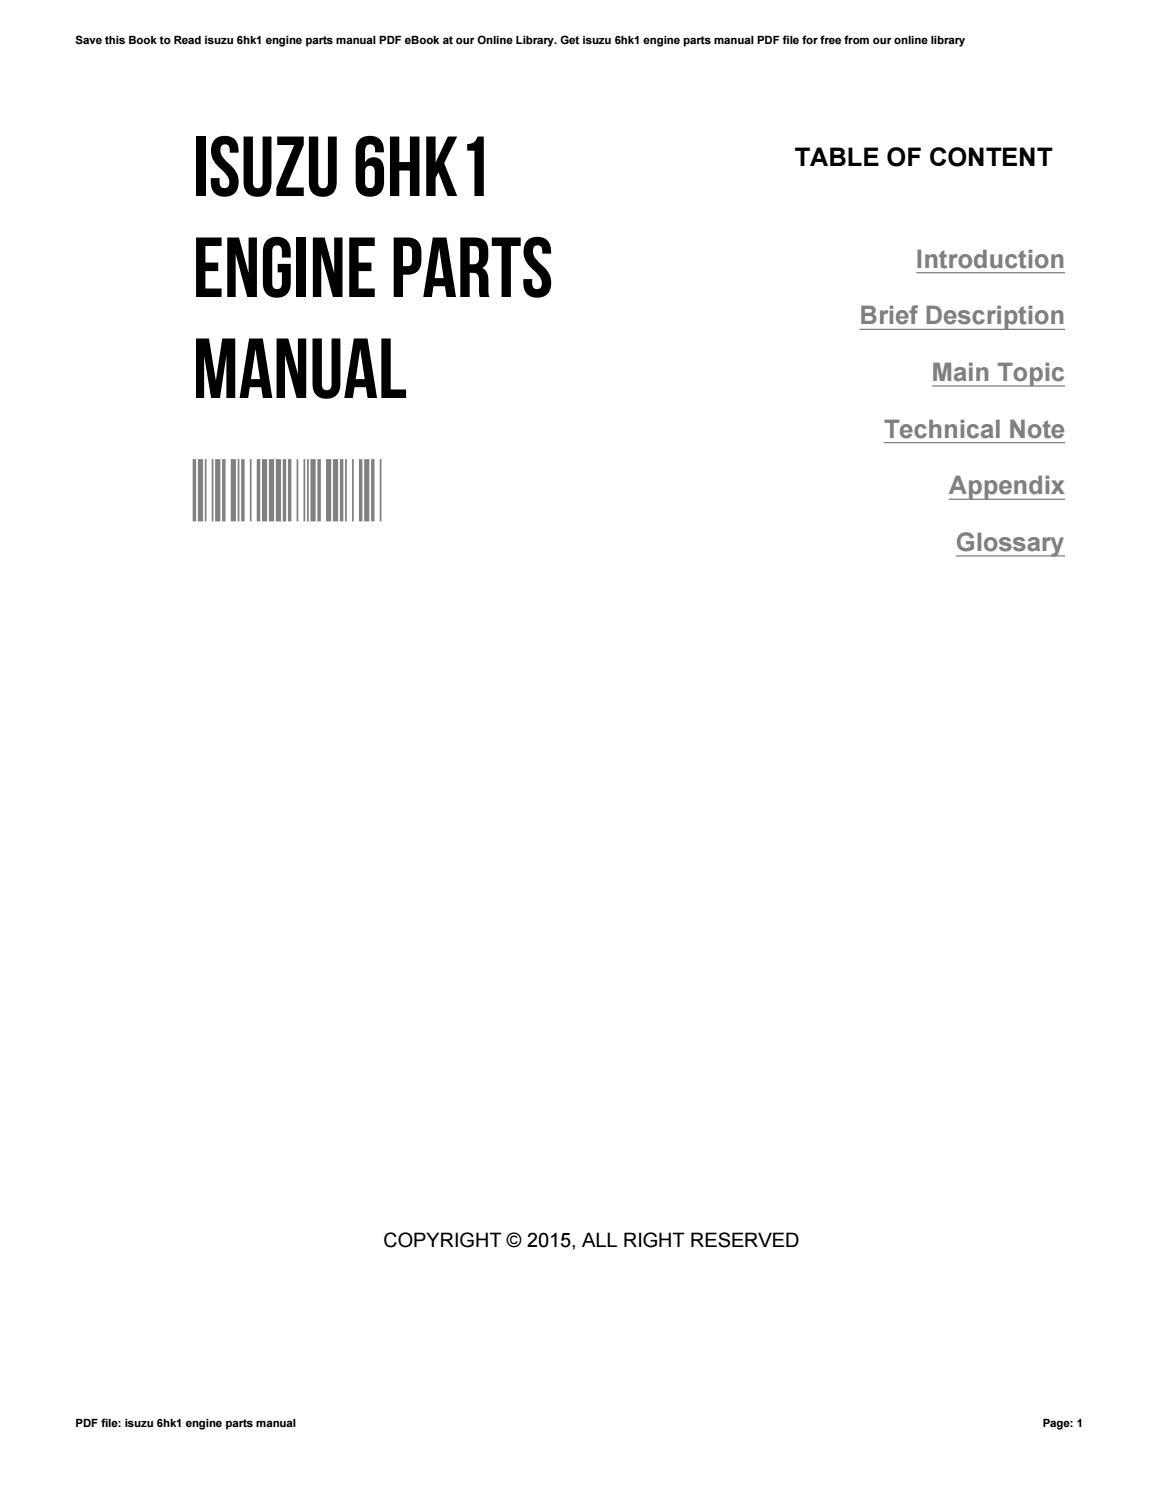 isuzu 6hk1 engine parts manual by johncrawford1752